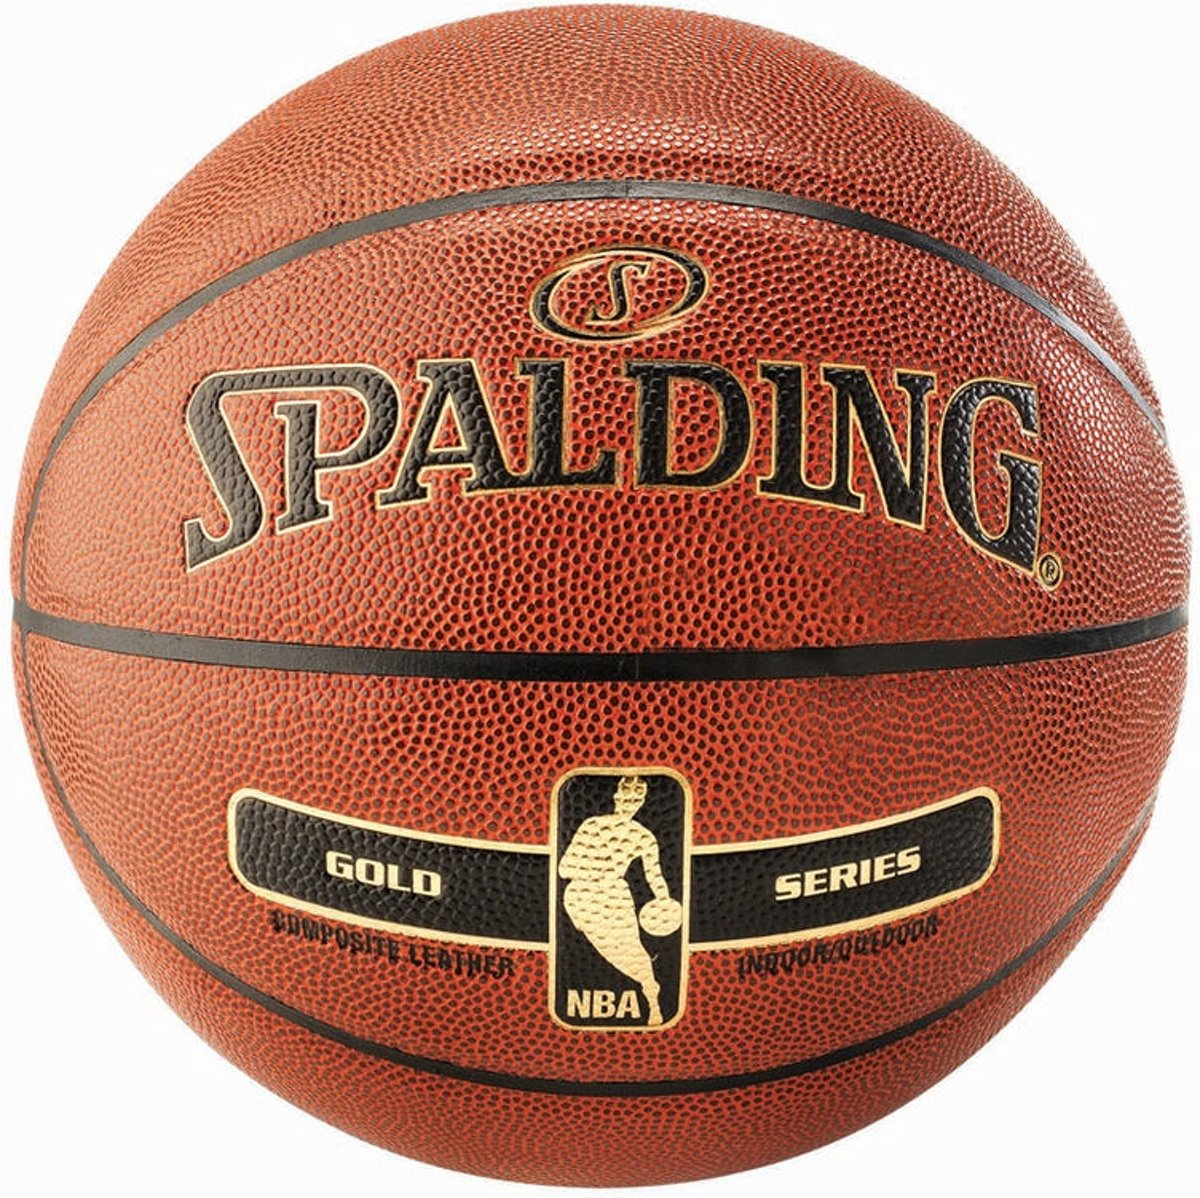 Spalding Basketball NBA Gold maat 5, 6 en 7 kopen